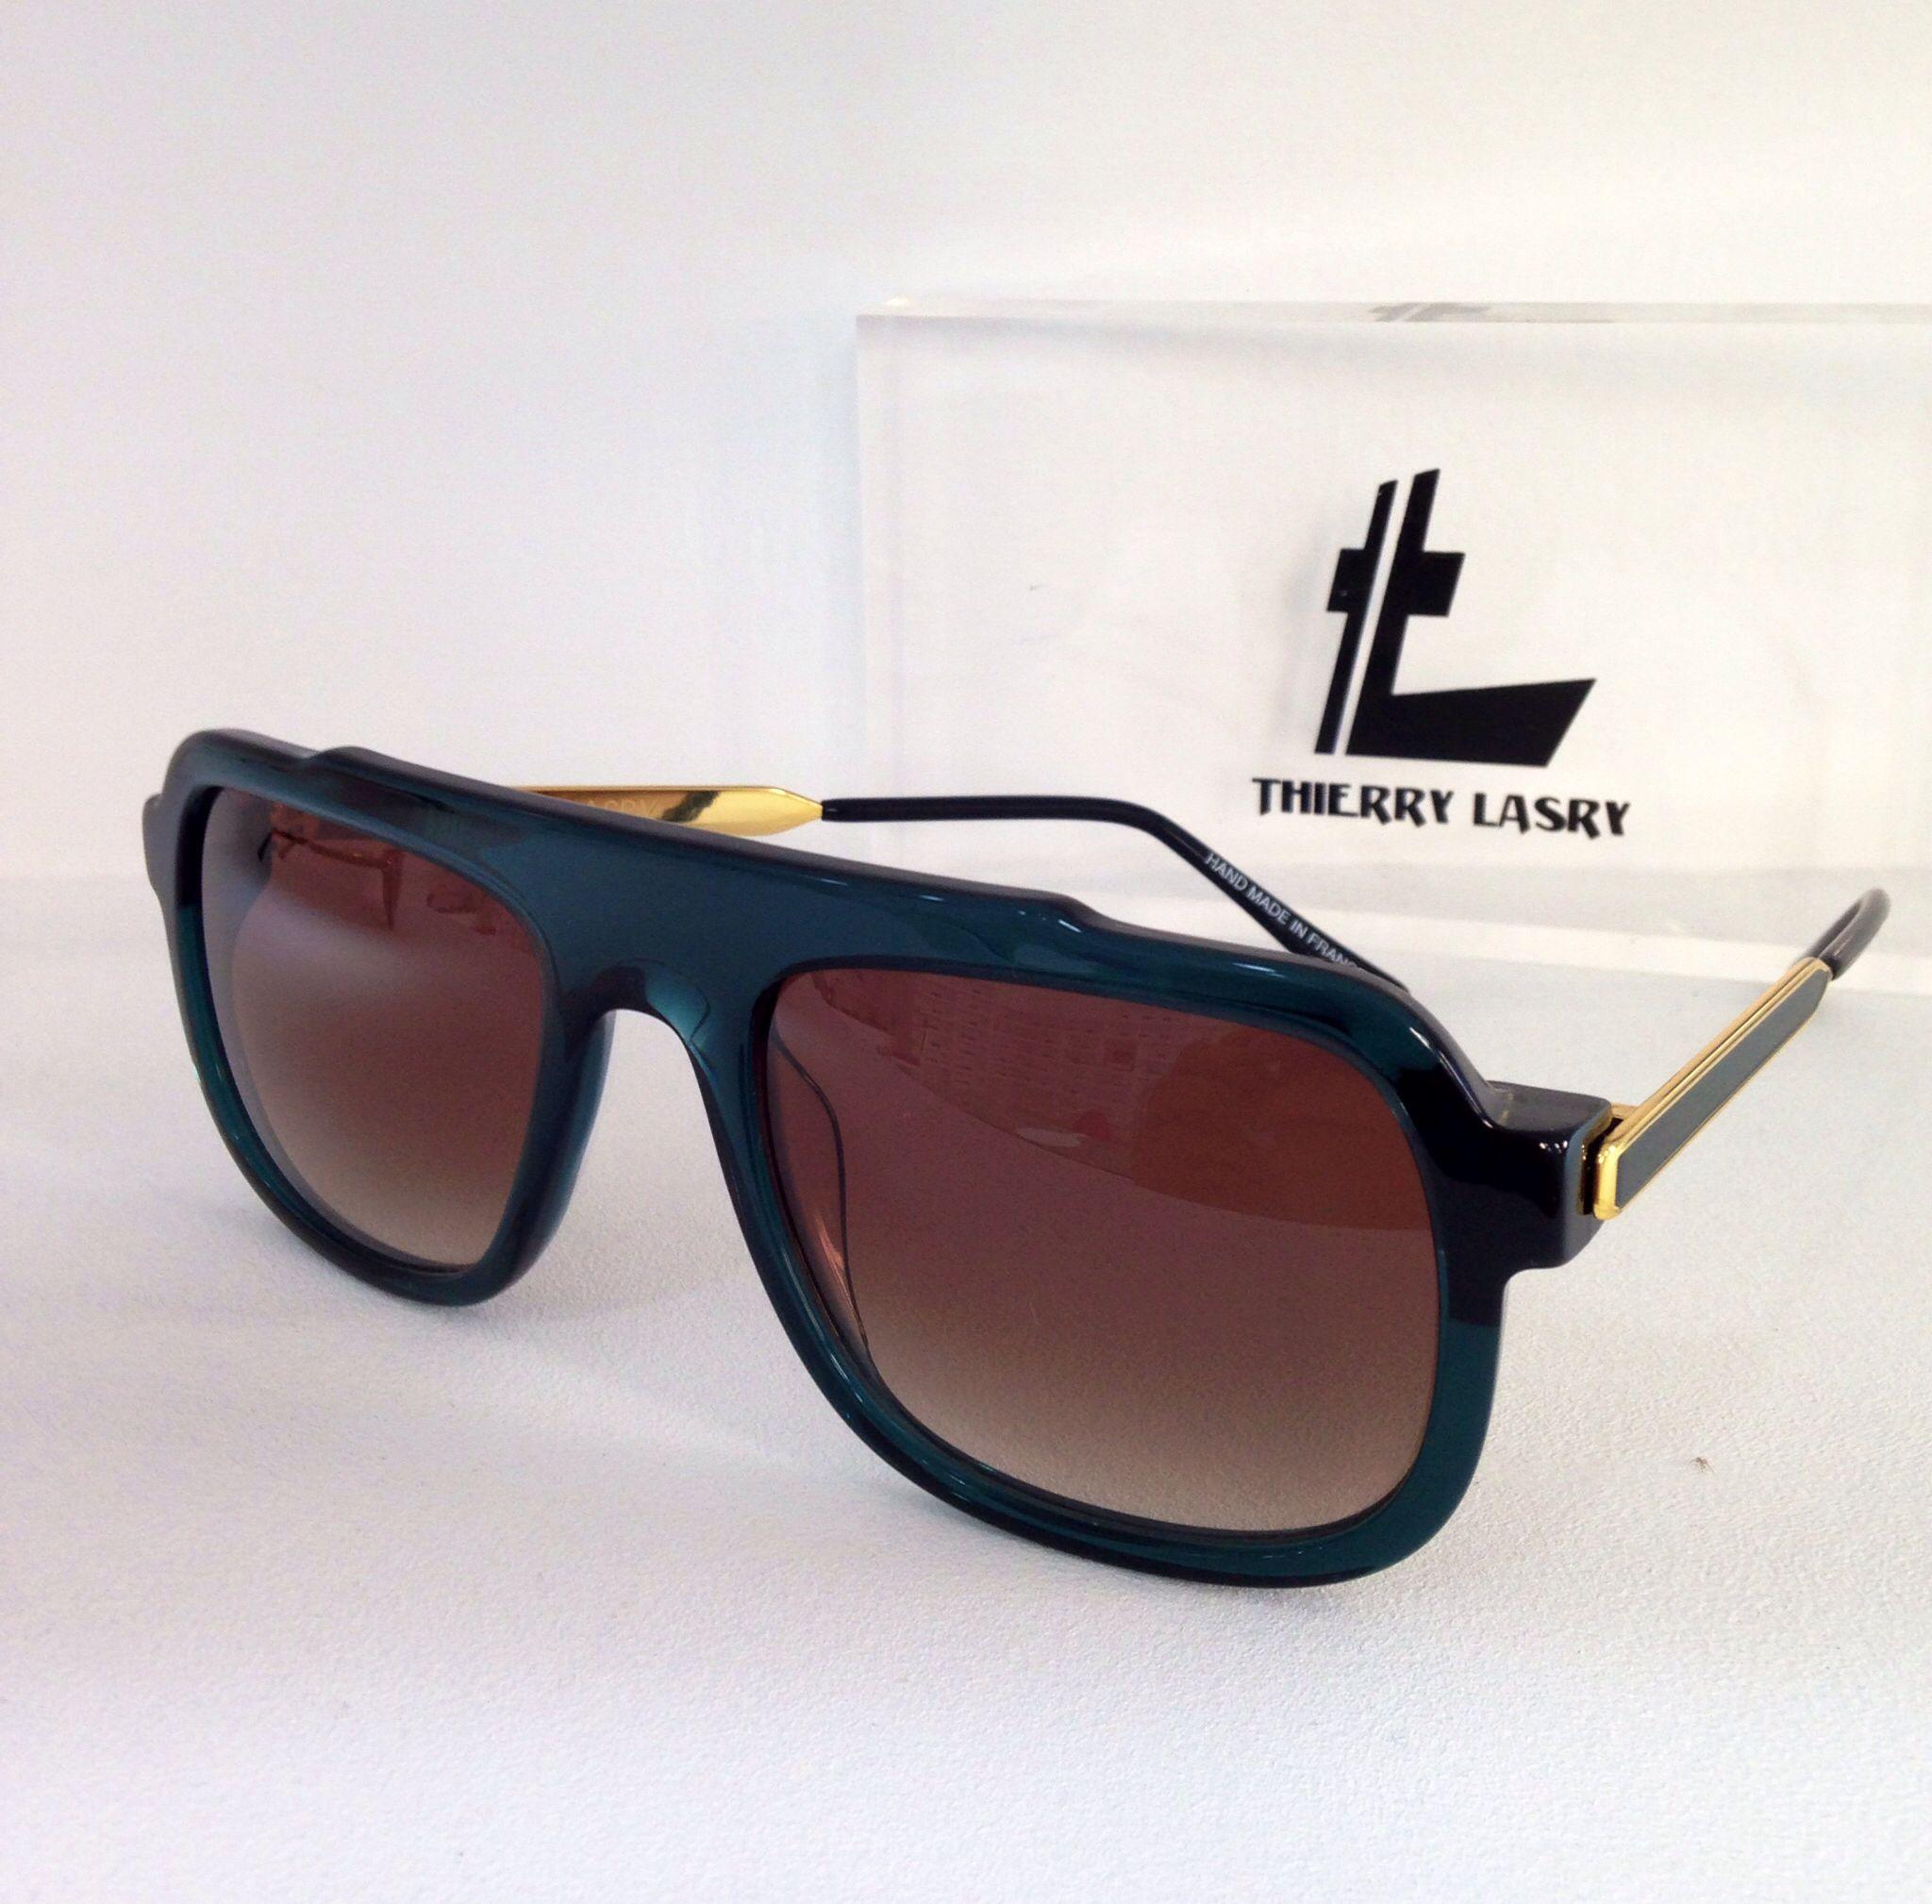 Thierry Lasry Mastery @_sunglassisland @thierrylasry #sunglassisland #thierrylasry #france #handmade #islascanarias #lapalma #sunglasses #eyewear www.sunglassisland.es